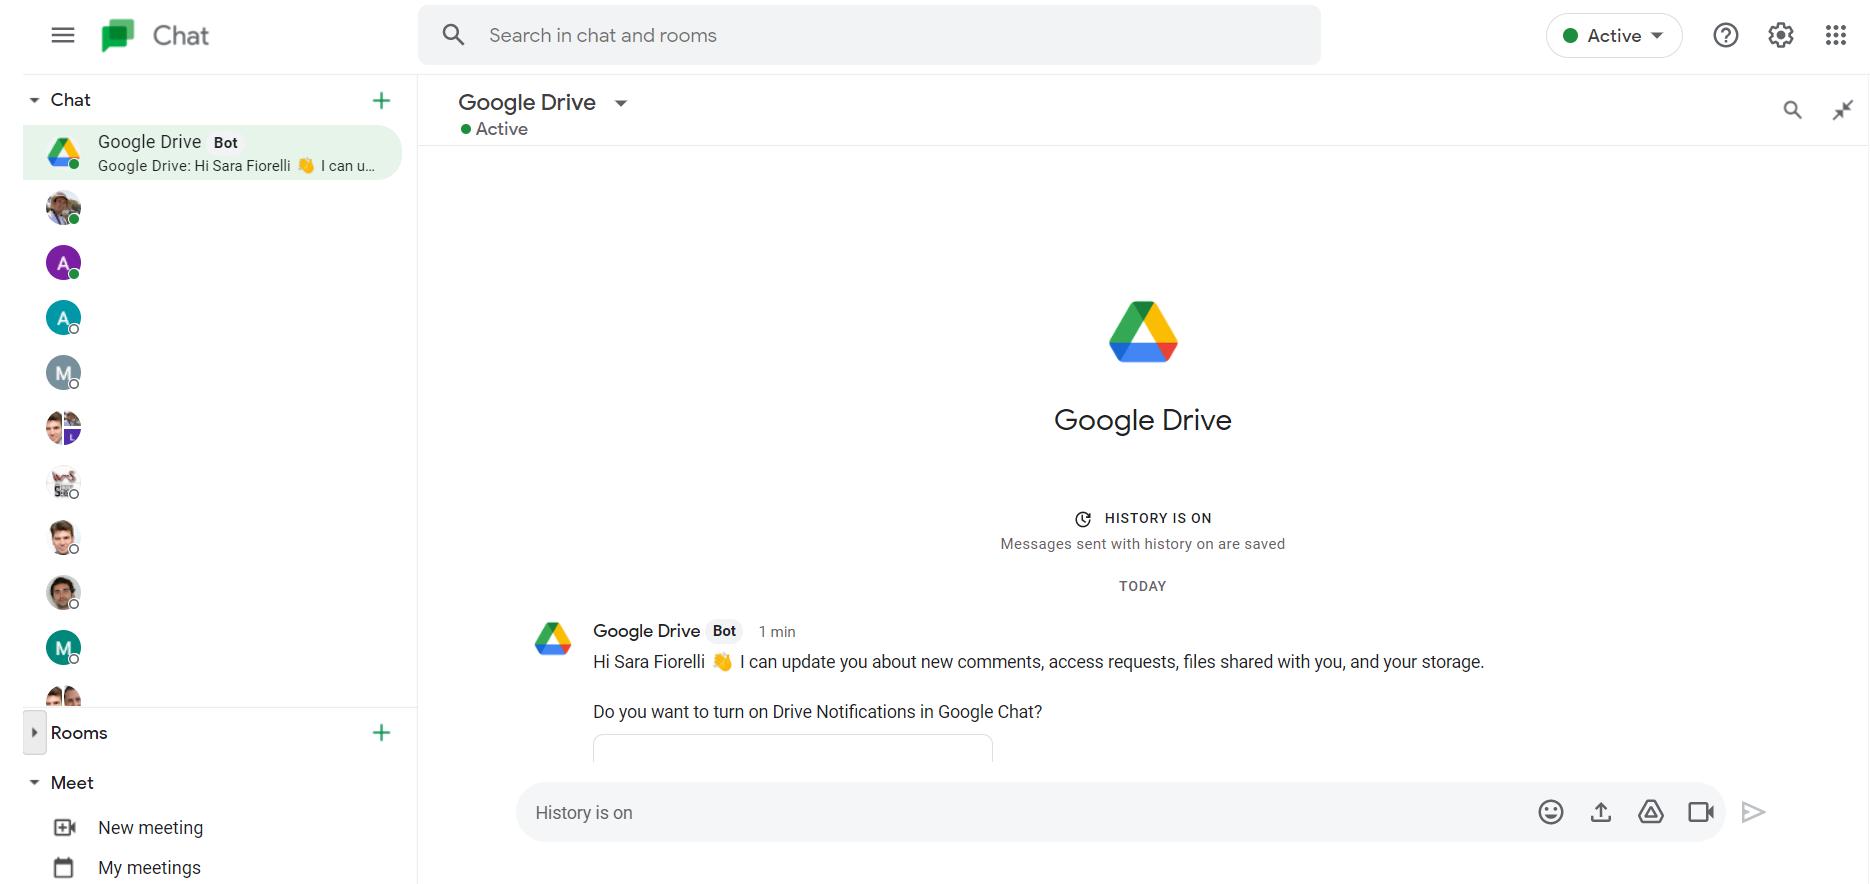 adding Google Drive bot